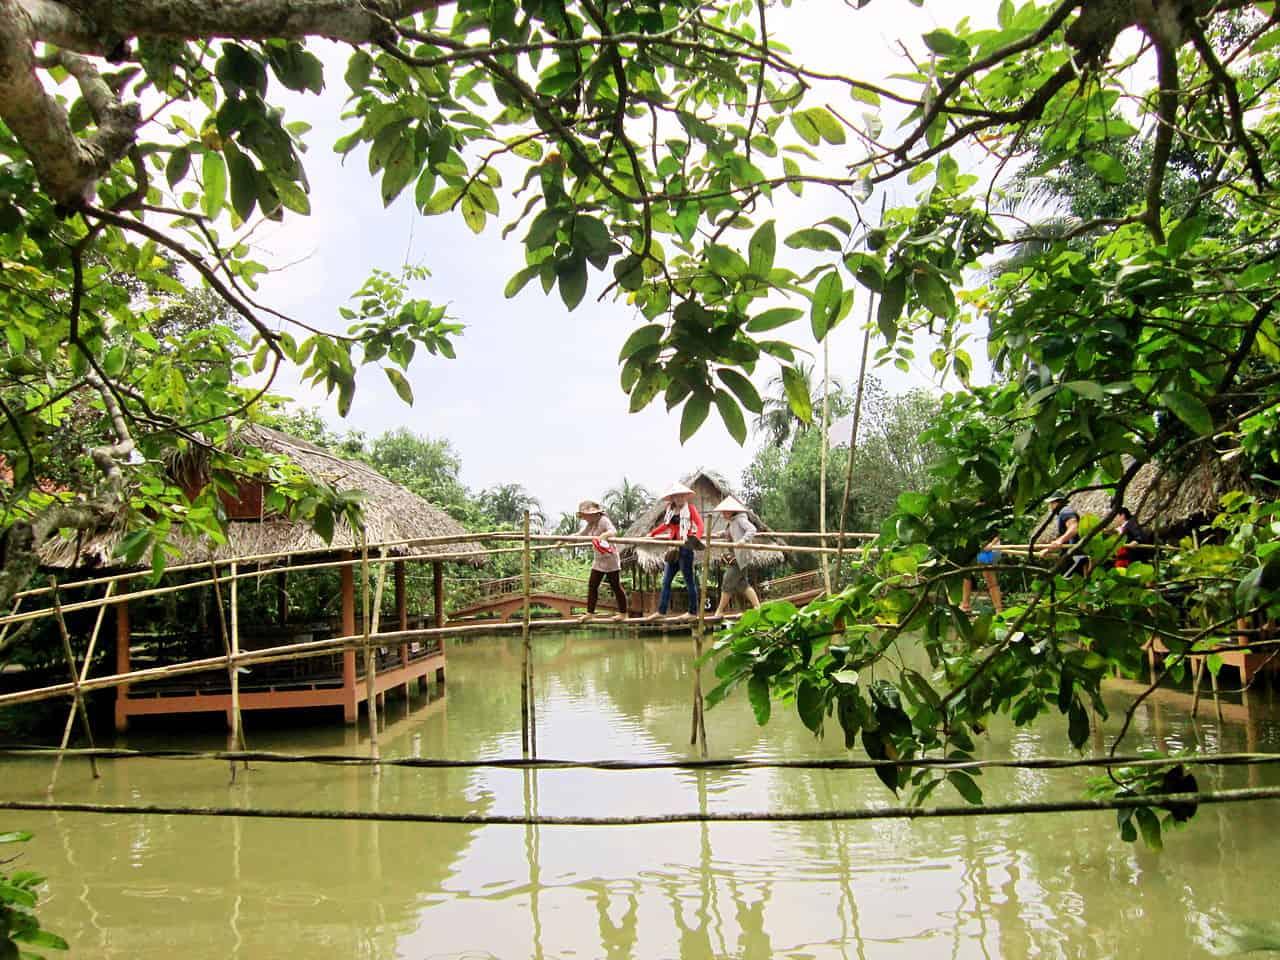 Go across Monkey bridge in Mekong Delta